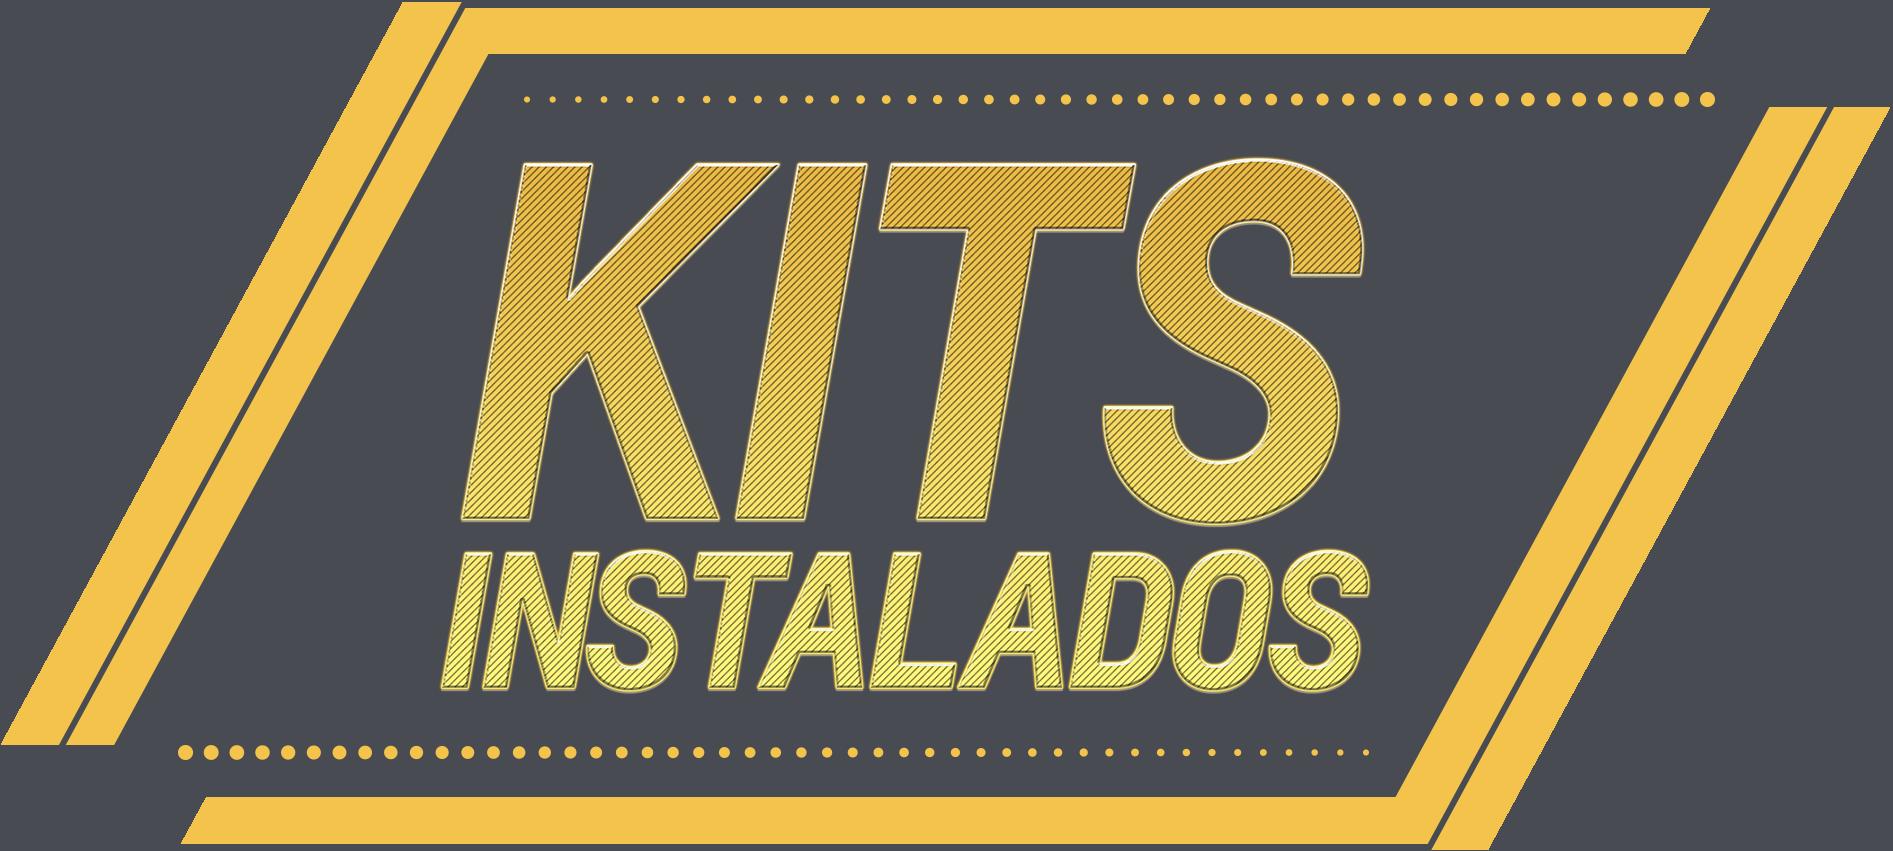 KITSINSTALADOS